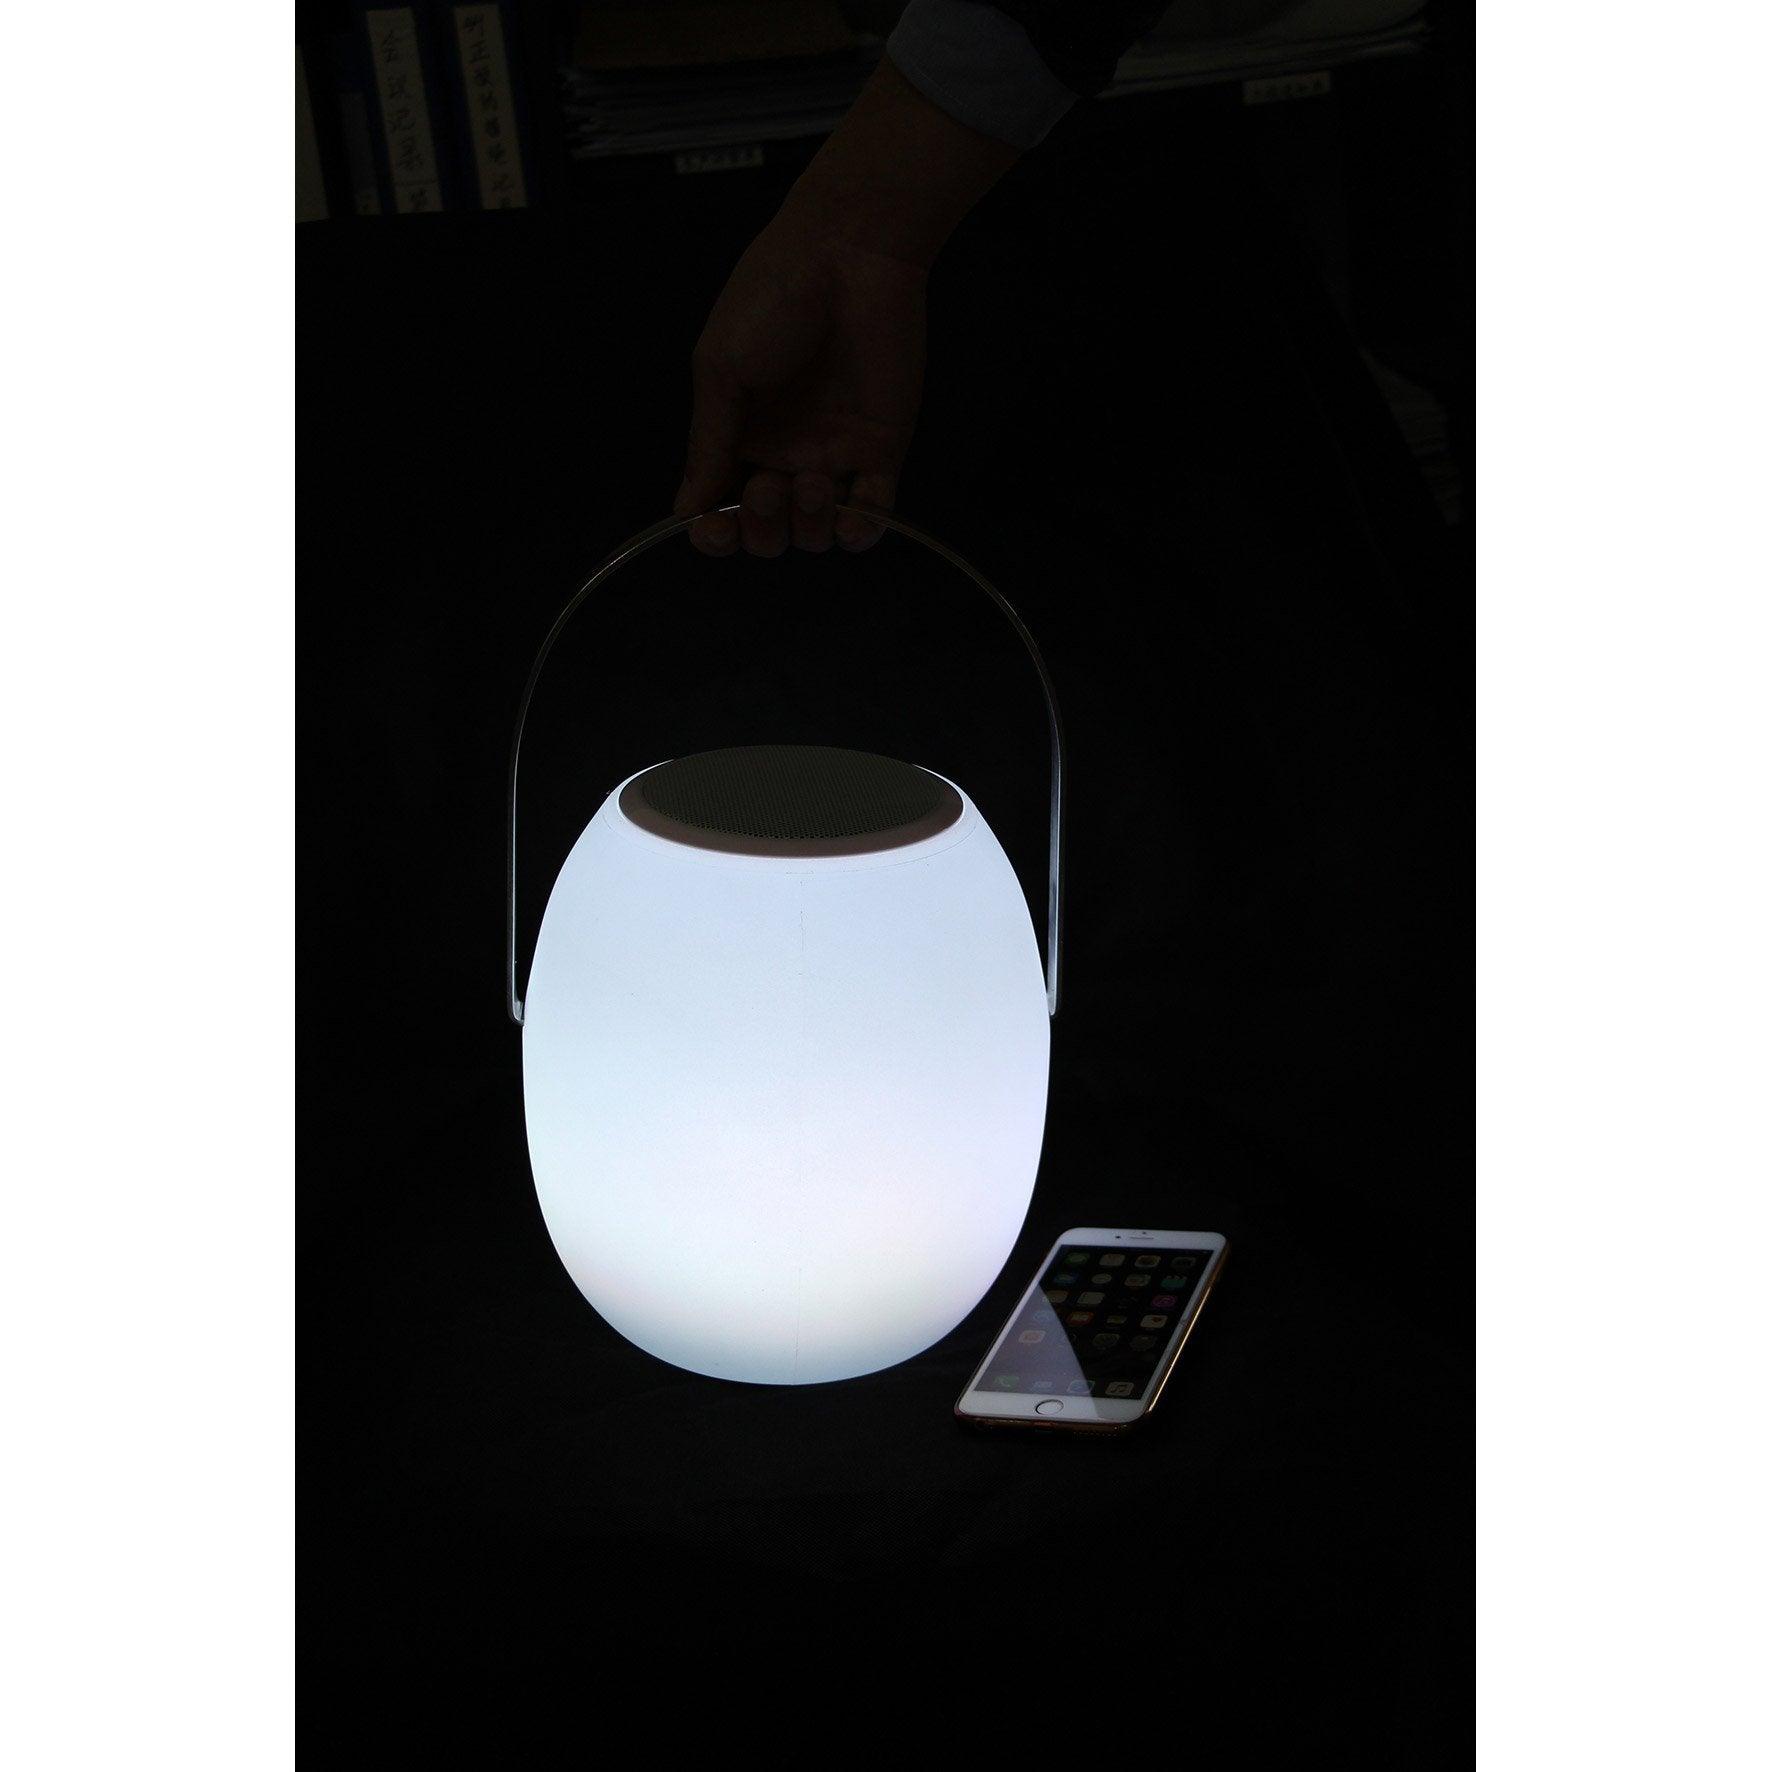 Lampe lumineux Nomade ovale sound h23cm LED intégrée blanc VARANGUE